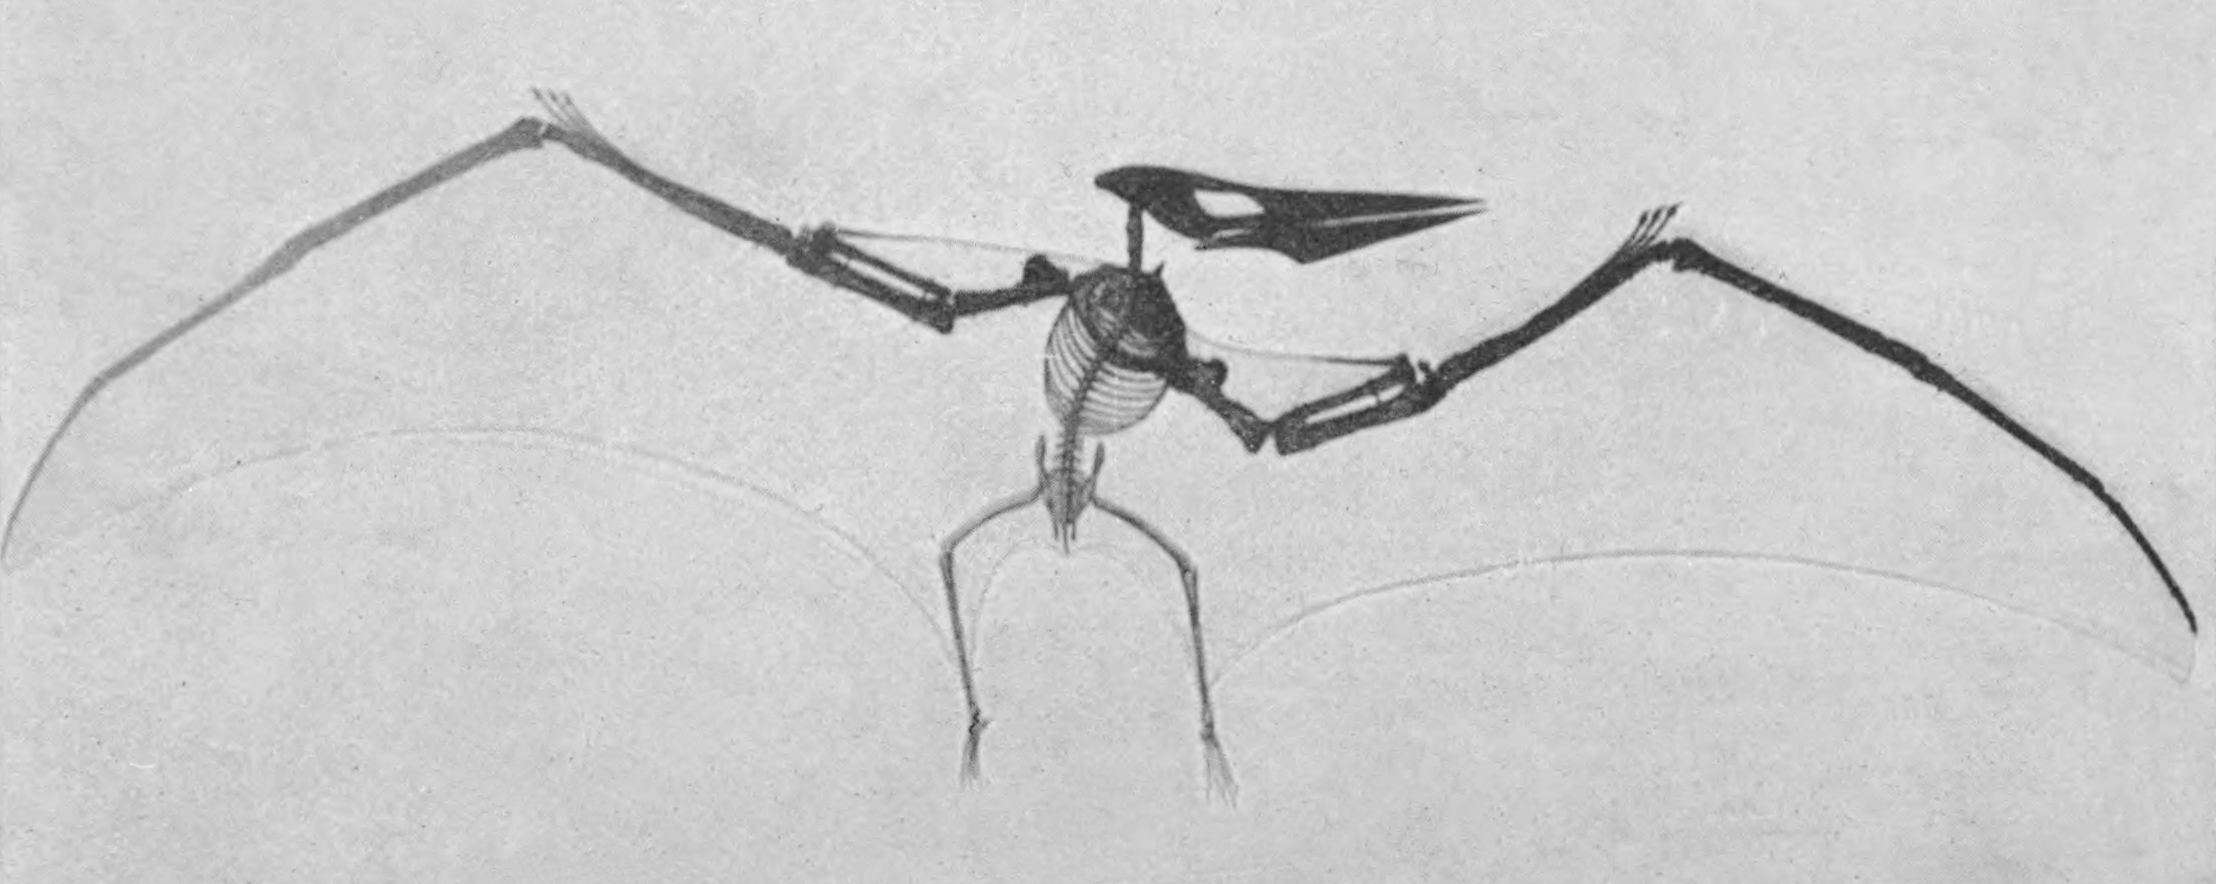 https://upload.wikimedia.org/wikipedia/commons/8/84/Old_Pteranodon_mount.jpg